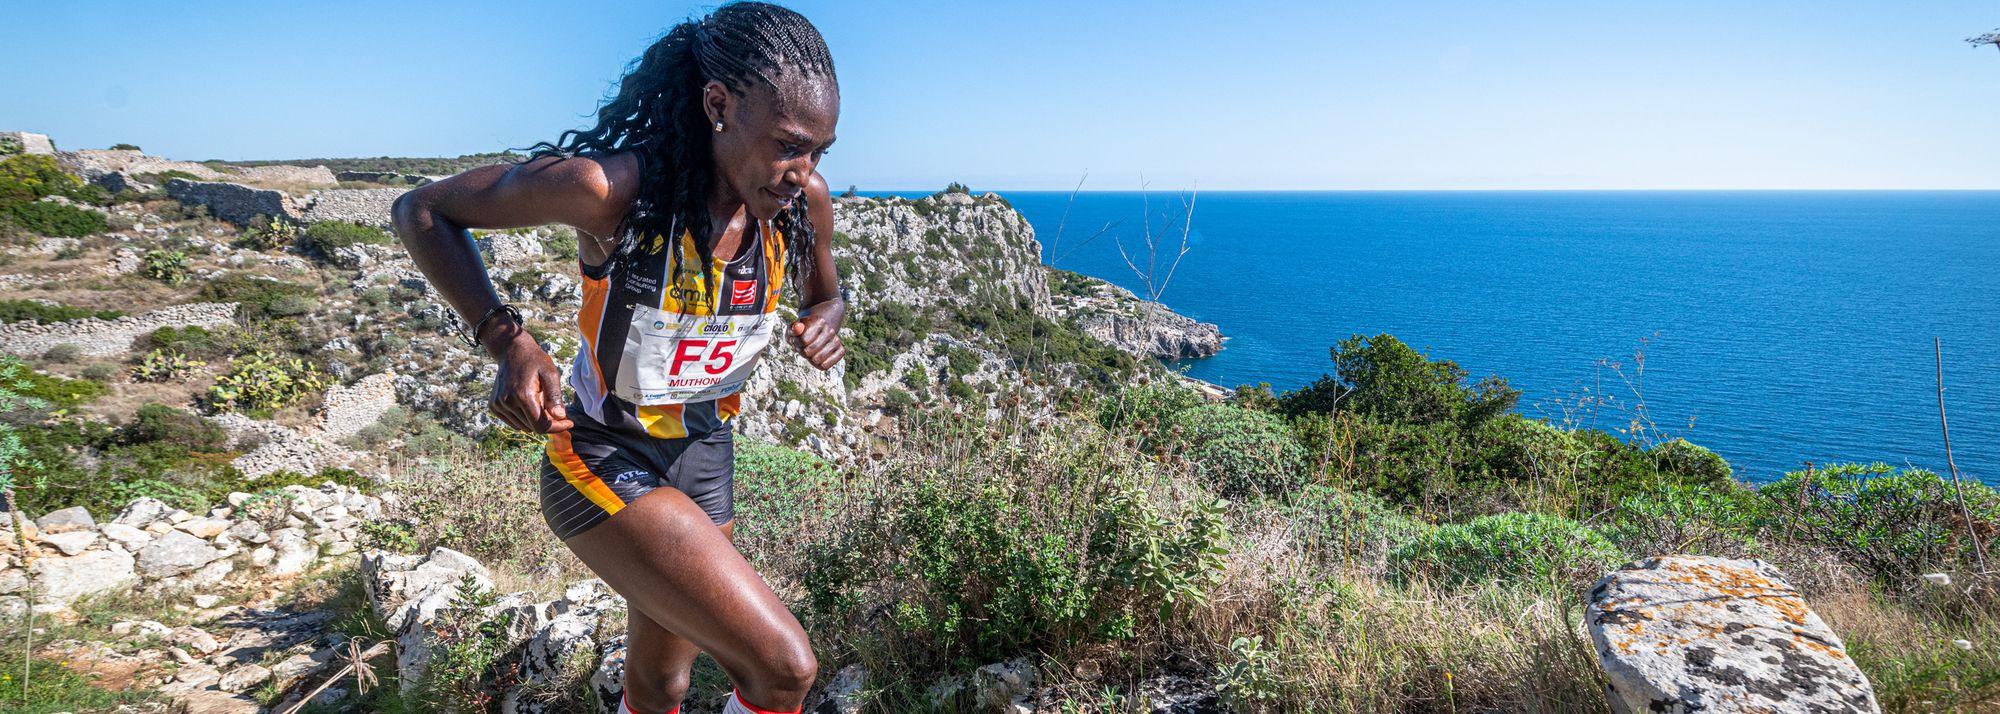 Kenya's Joyce Muthoni Njeru and Eritrea's Petro Mamu were victorious at the Trofeo Ciolo mountain running race in the Puglia region of Italy